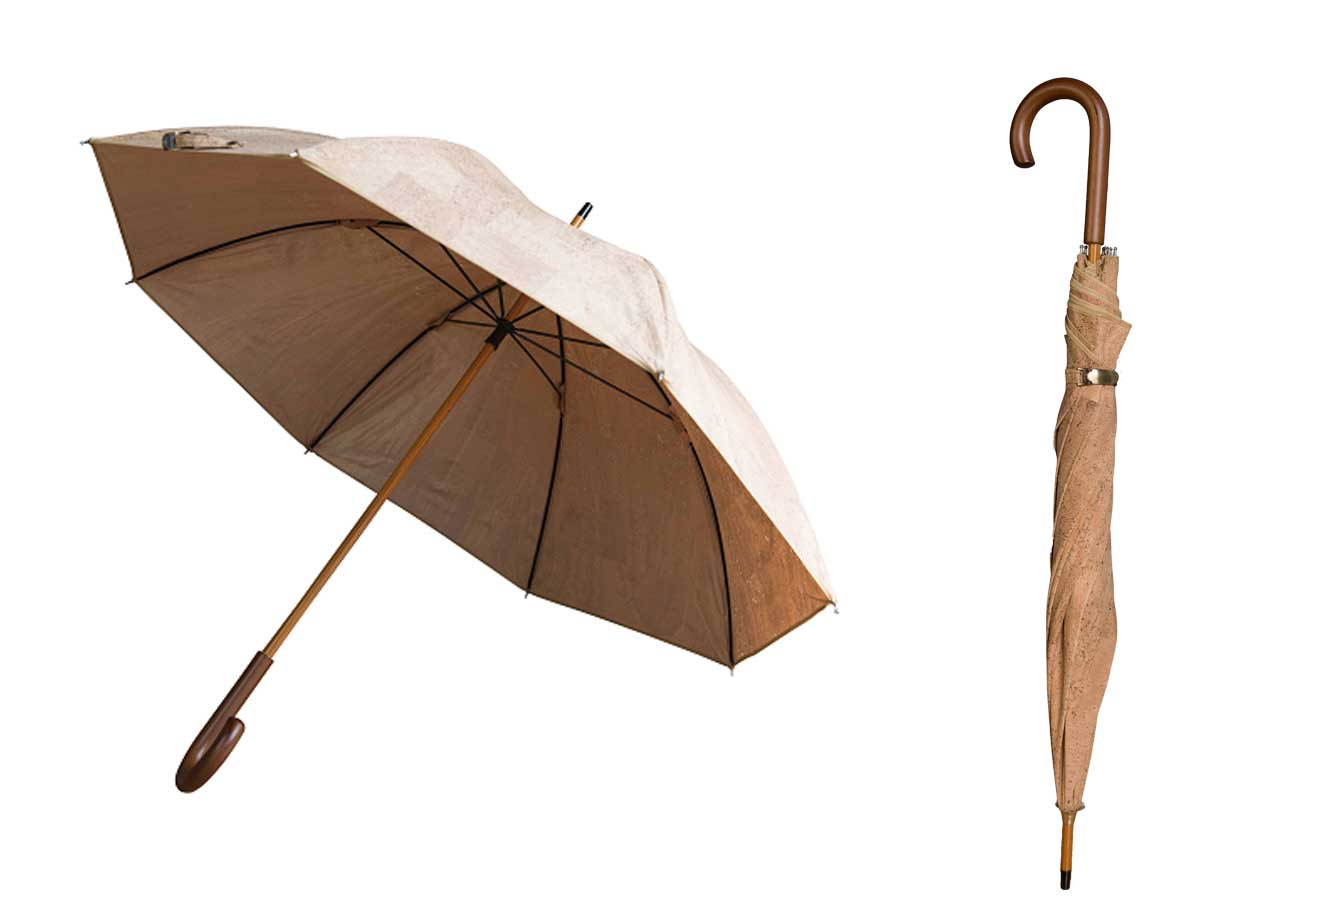 Bentley Cork Umbrella